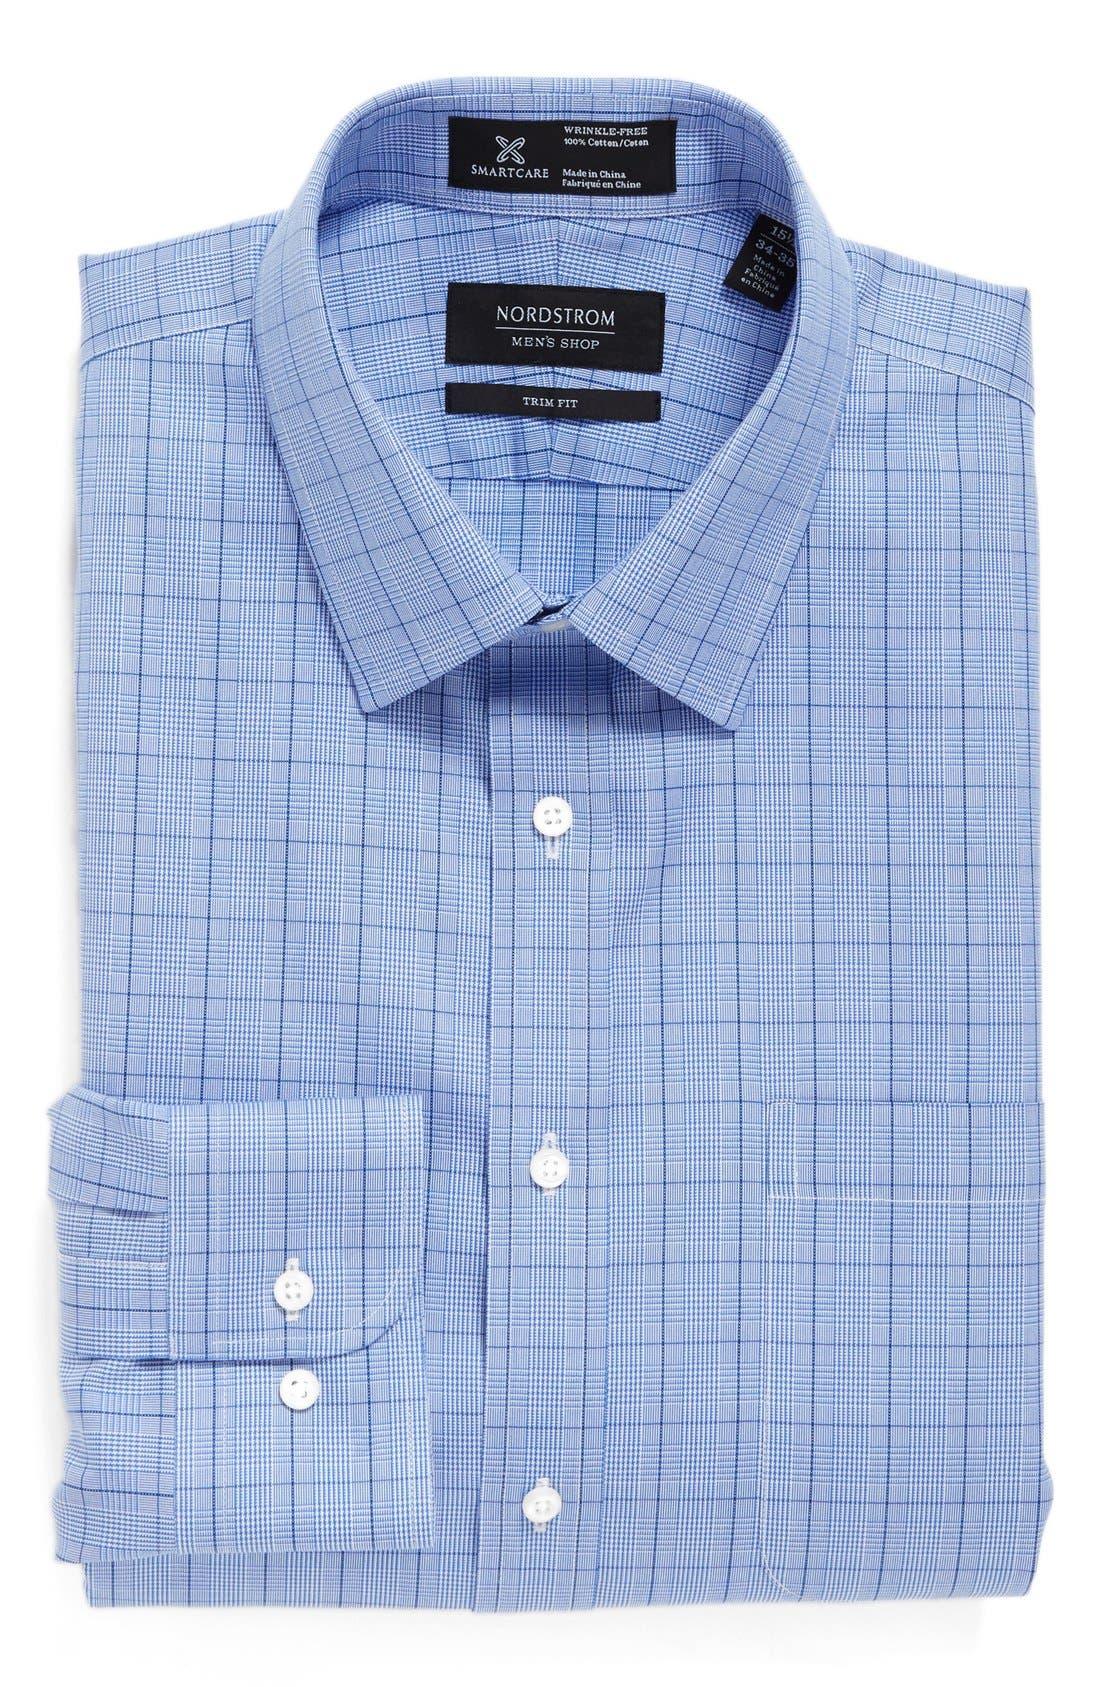 Nordstrom Menu0026#39;s Shop Smartcareu2122 Trim Fit Plaid Dress Shirt | Nordstrom